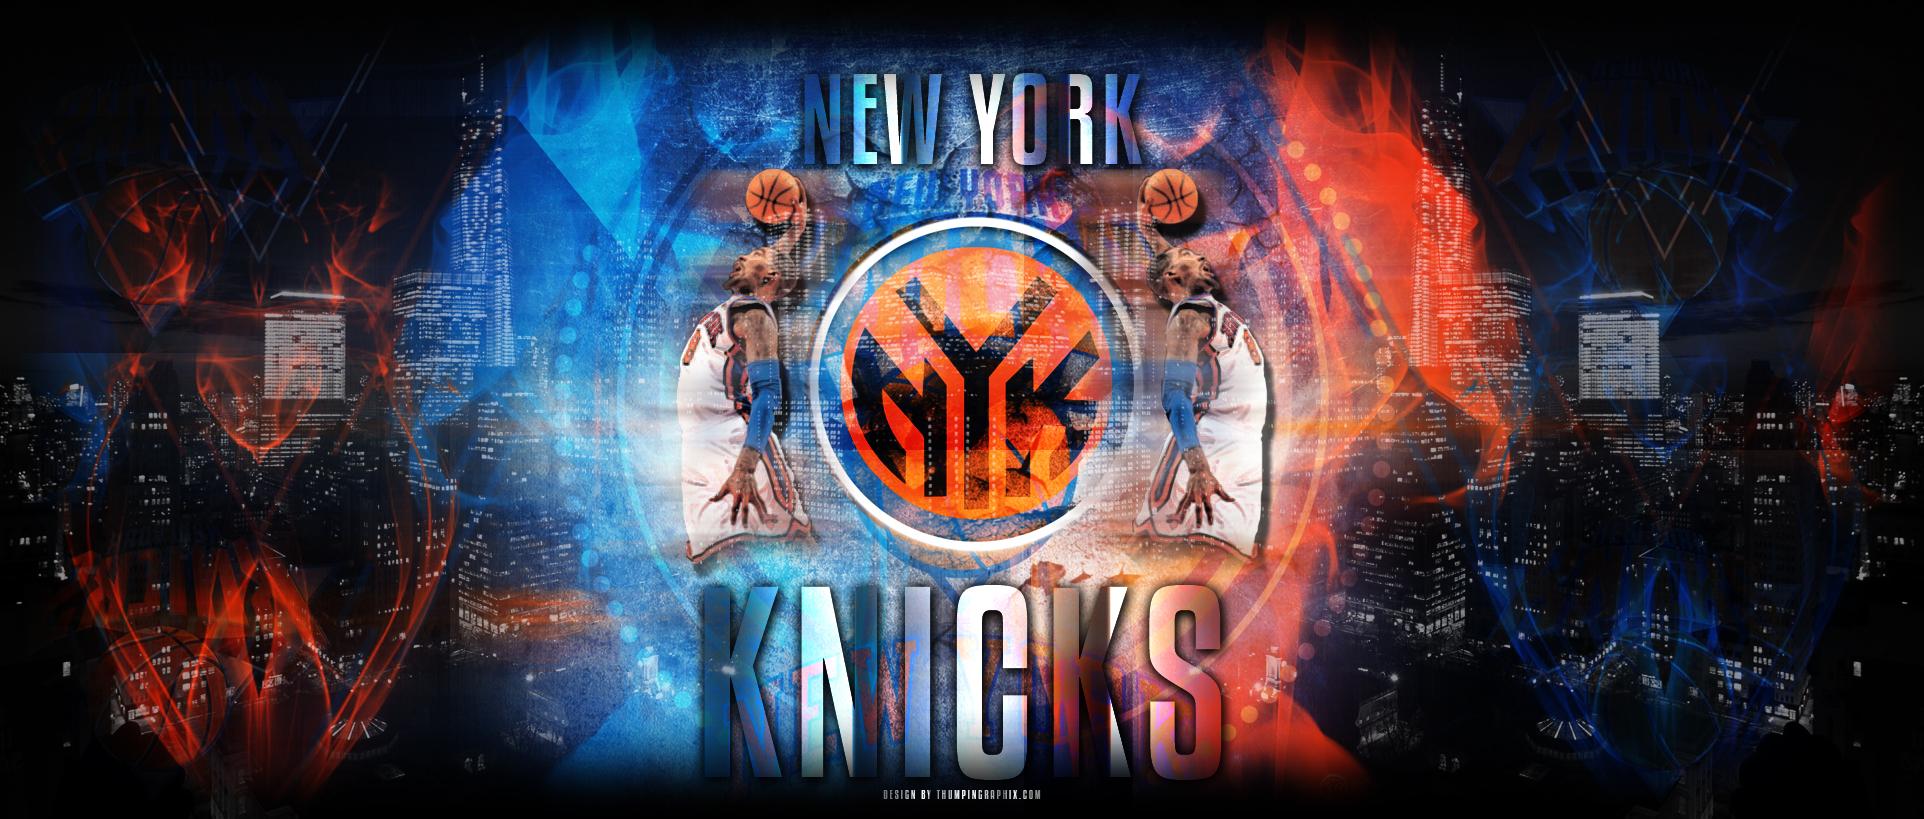 new york knicks wallpaper 2013 wallpapersafari